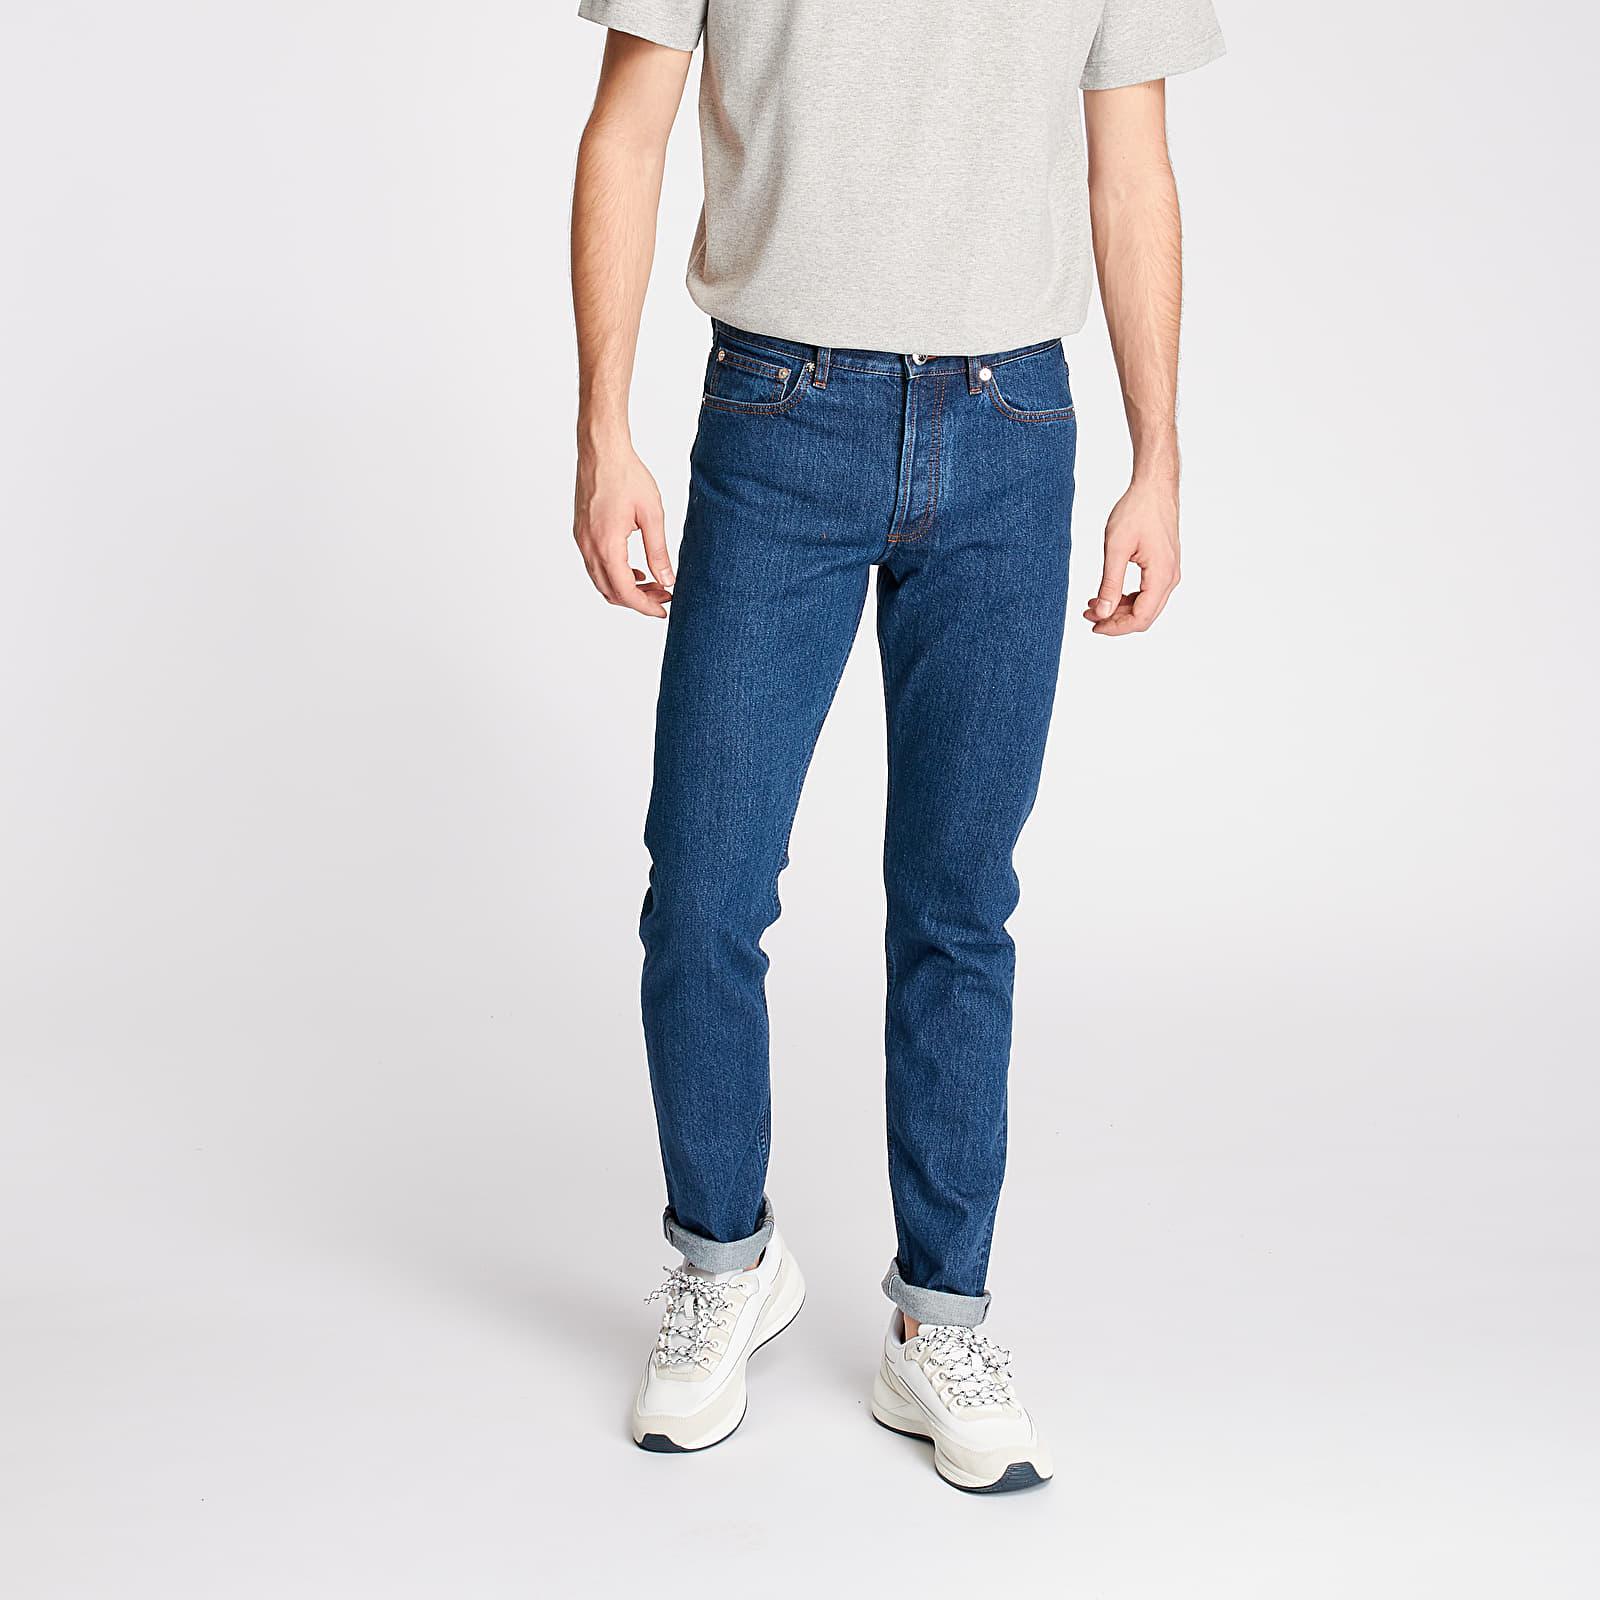 Pants and jeans A.P.C. Petit New Standard Jeans Dark Blue